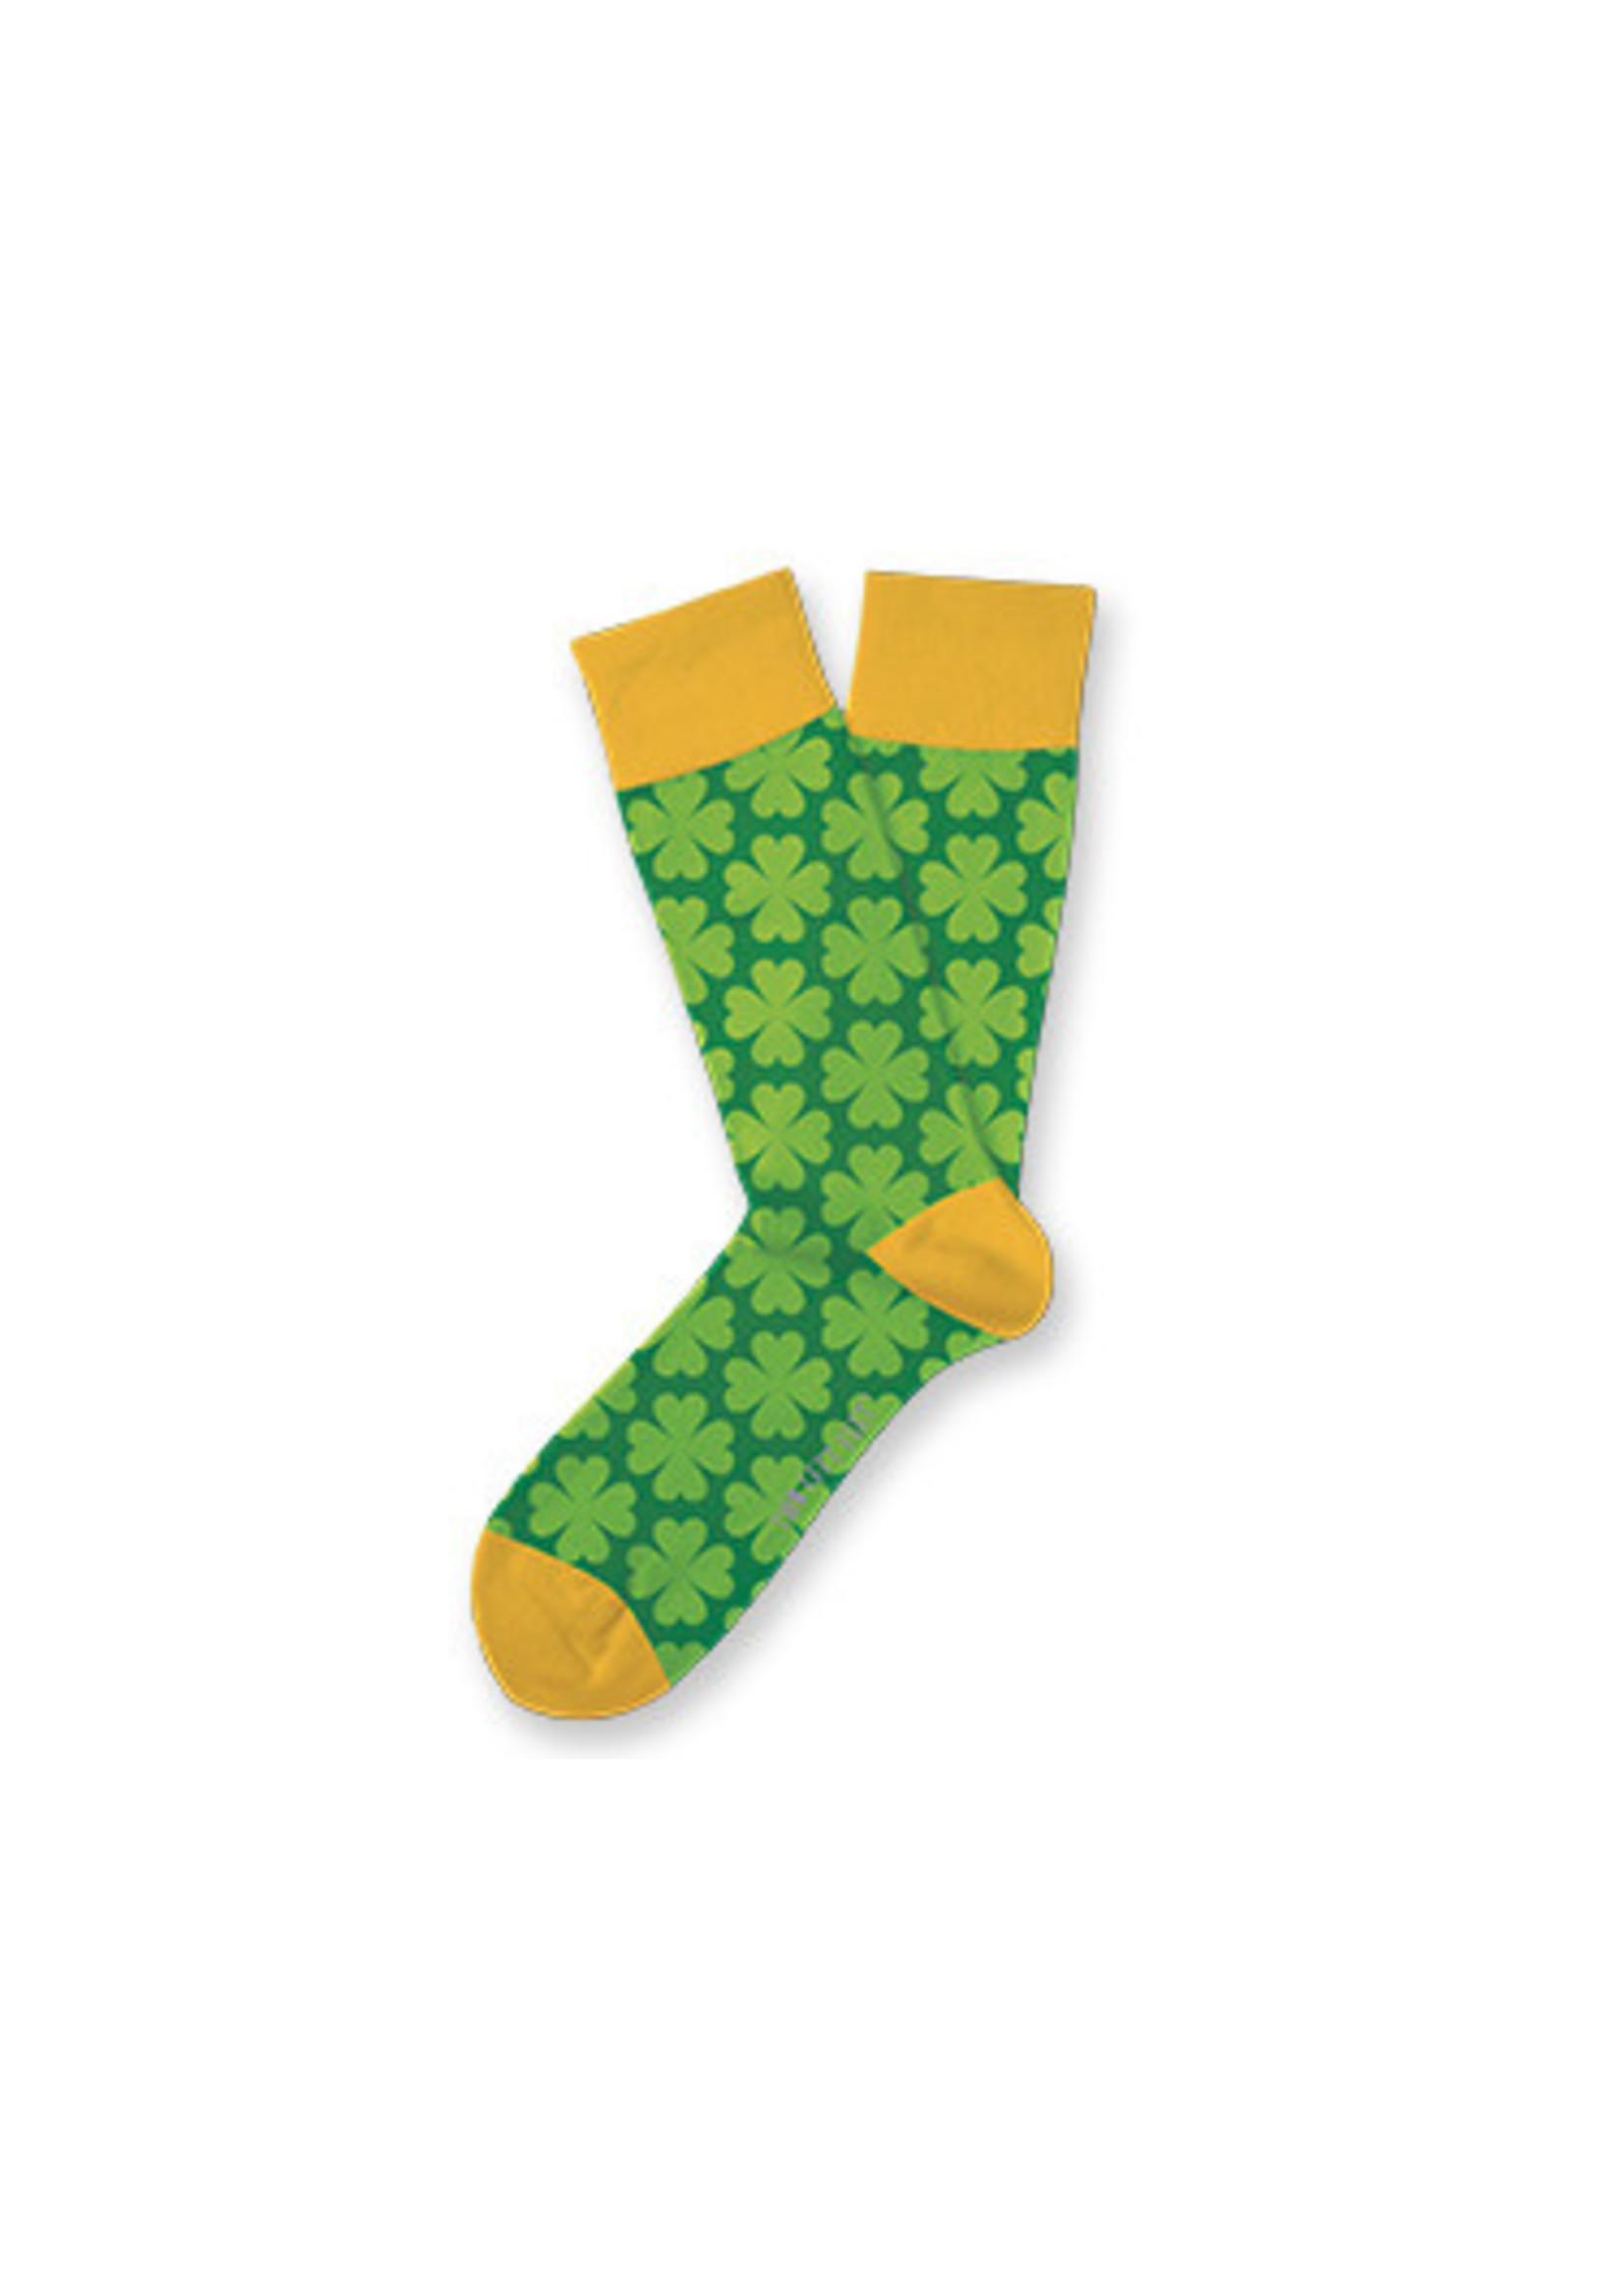 Shamrockin' Socks